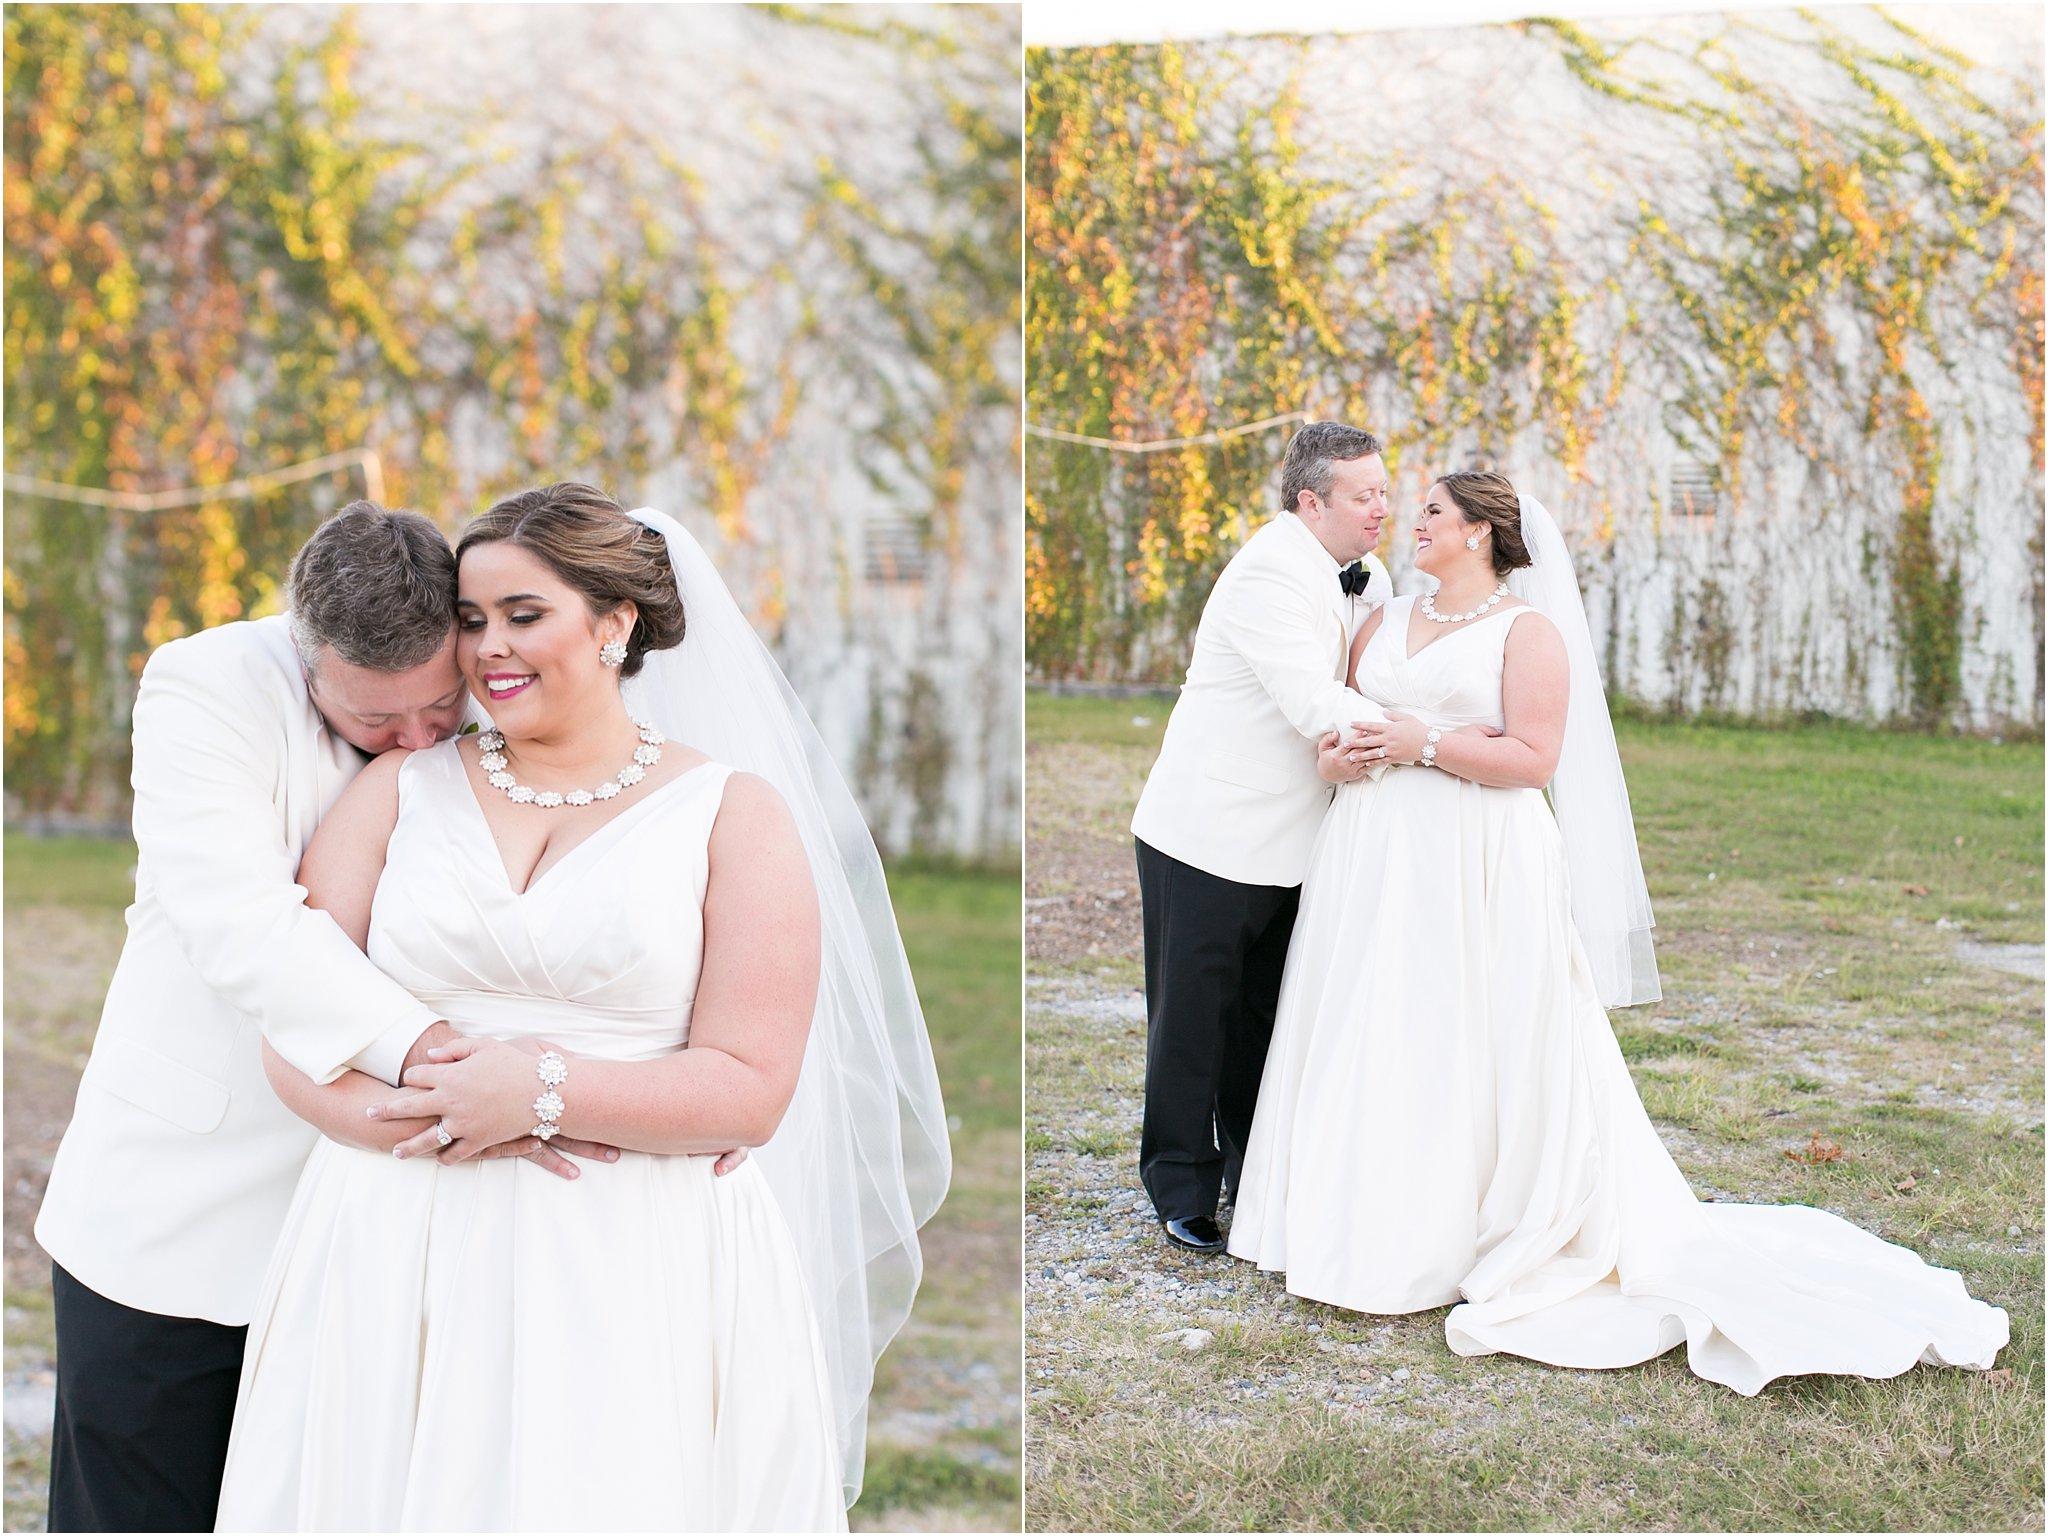 va_jessica_ryan_photography_virginia_wedding_norfolk_harrison_opera_house_norfolk_arts_district_portraits_3818